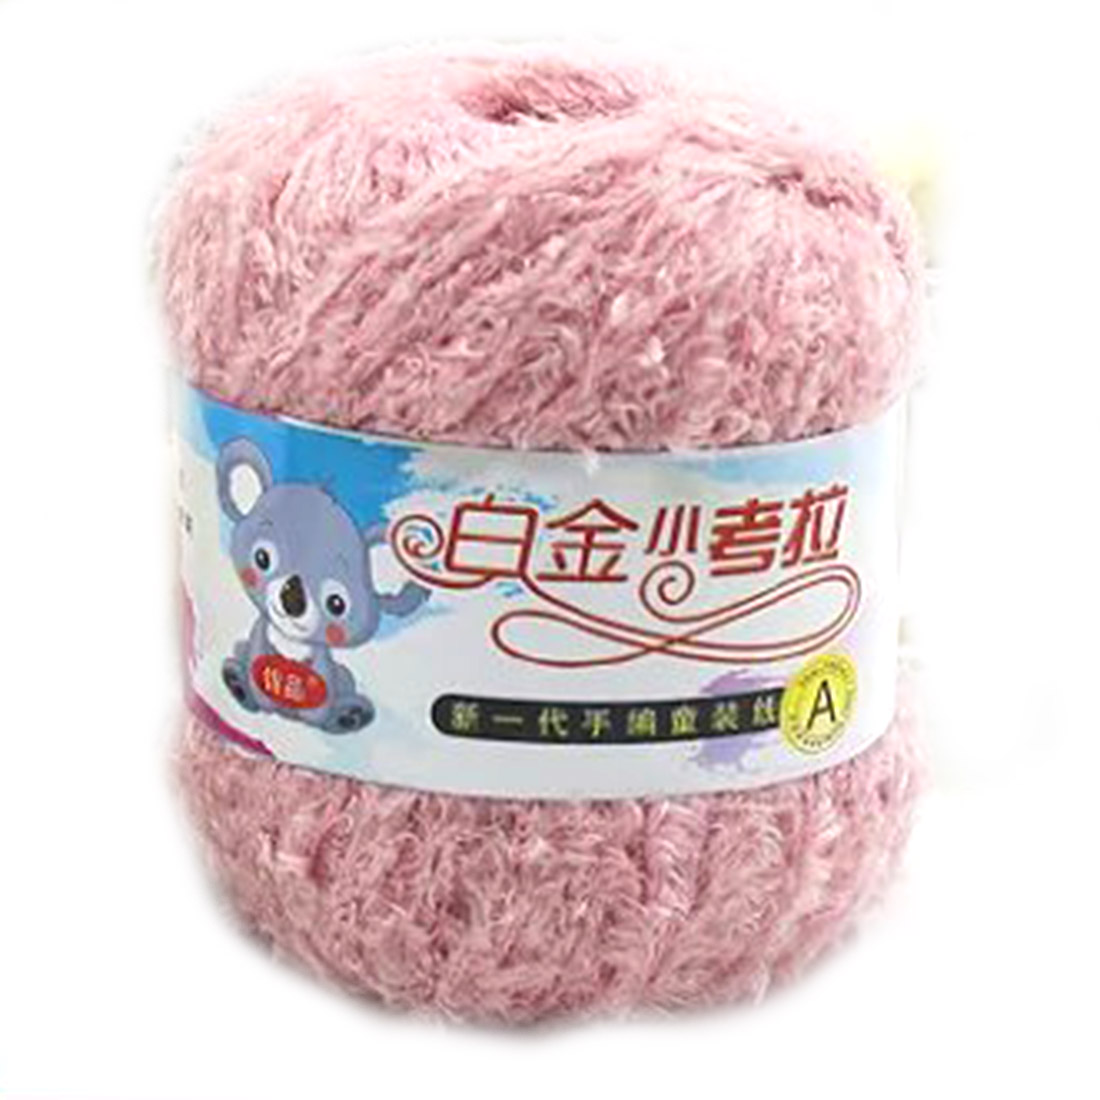 Велика мека топла дуга коса памучна - Уметност, занатство и шивање - Фотографија 3